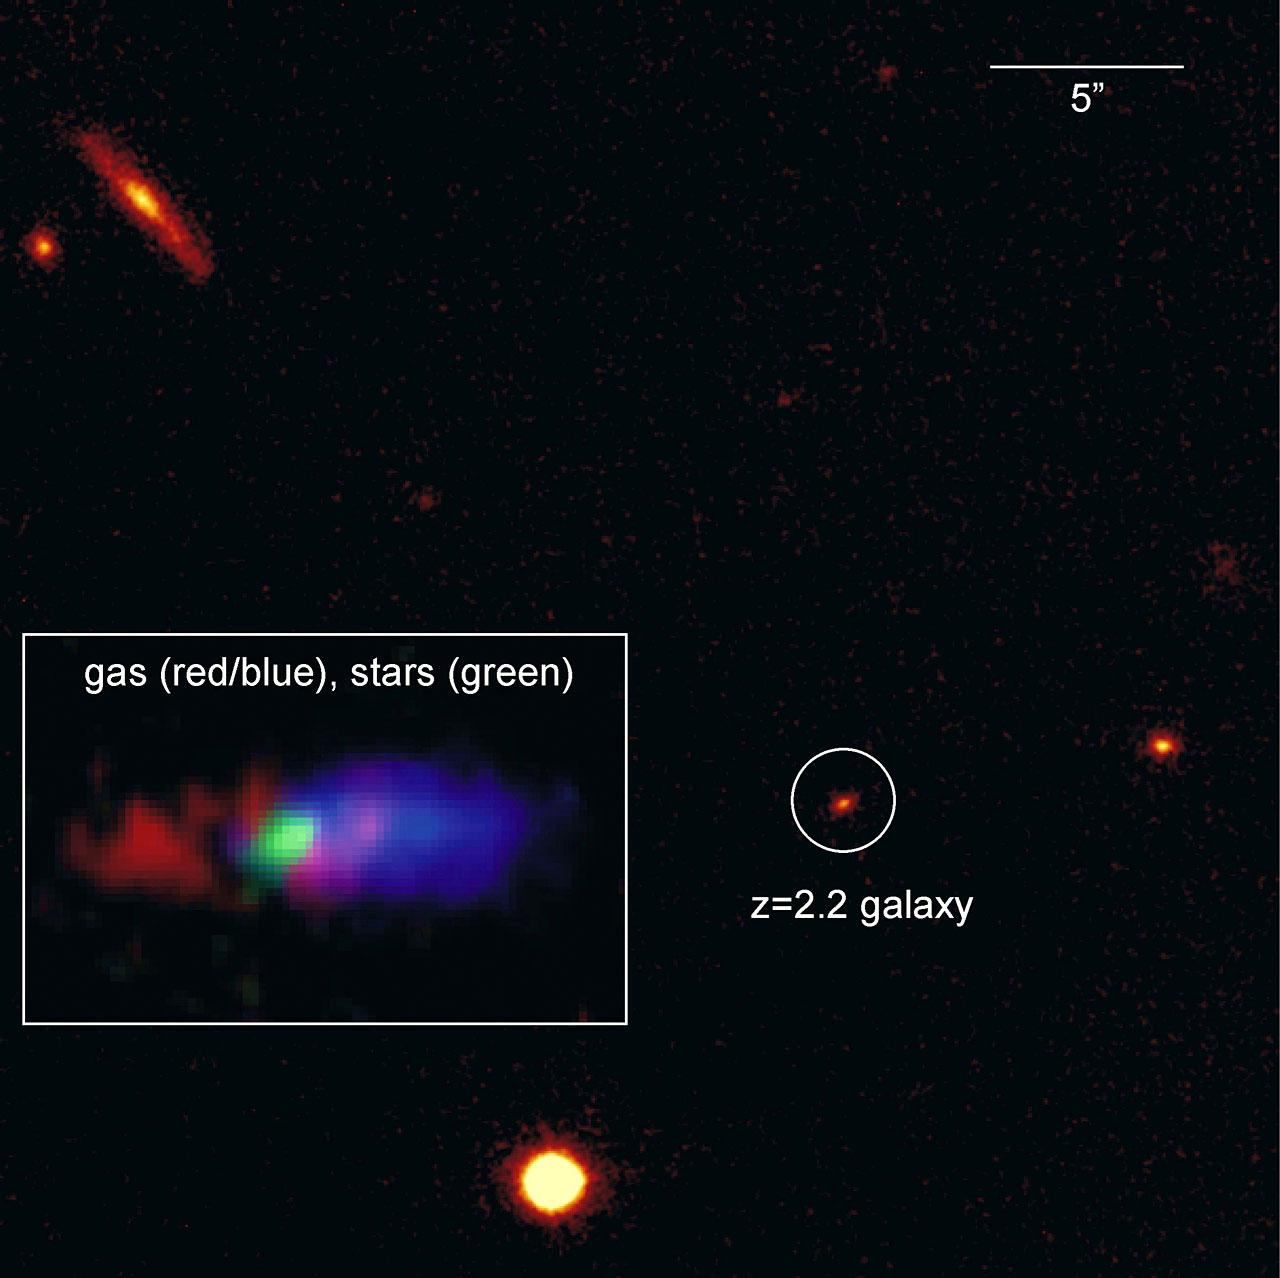 The Distant Galaxy K20-ID5